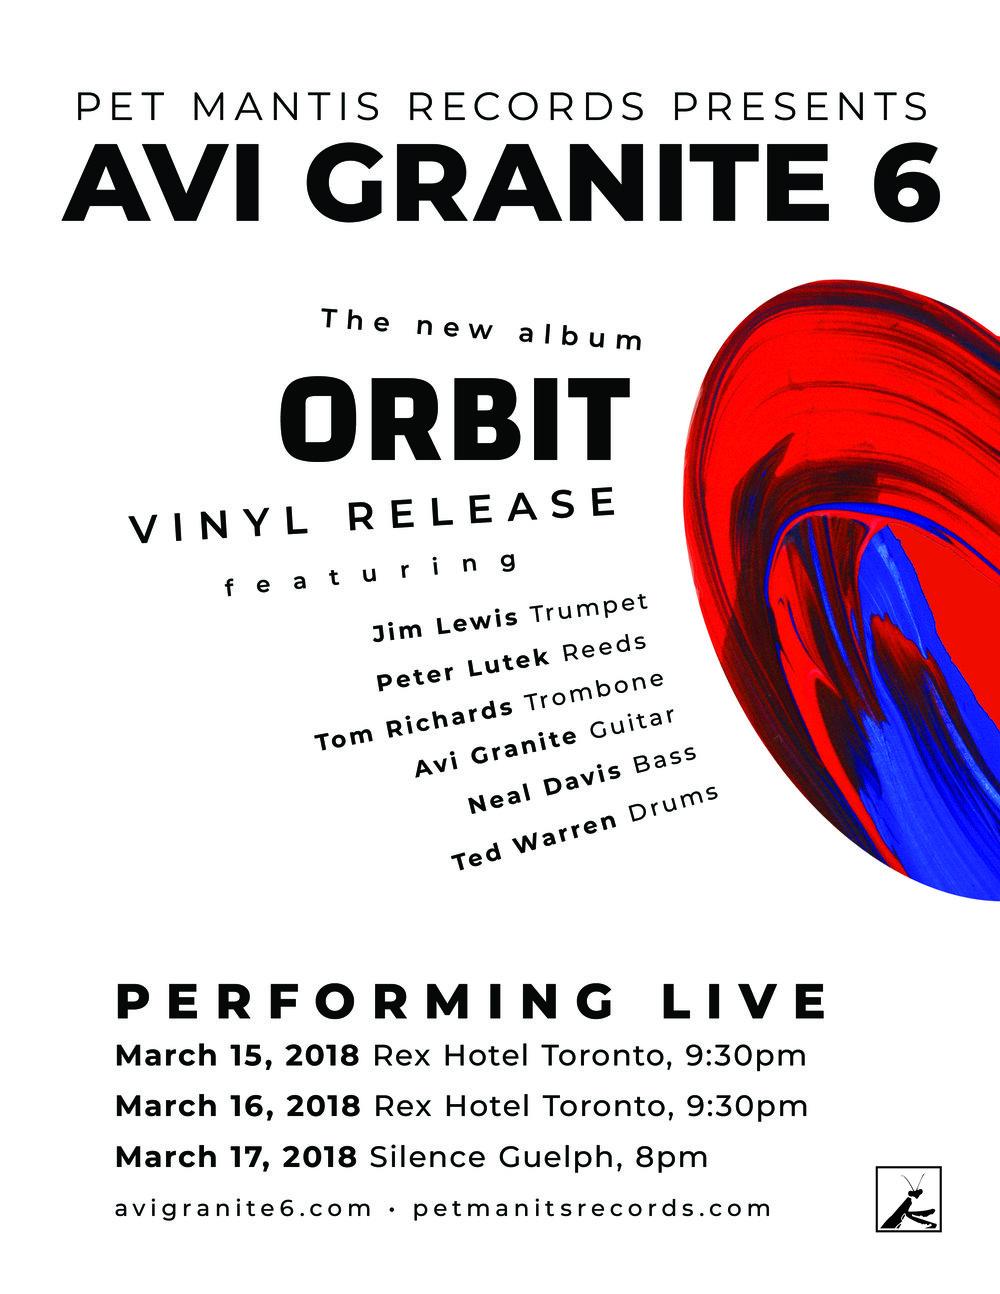 ag6-poster-march-2018.jpg